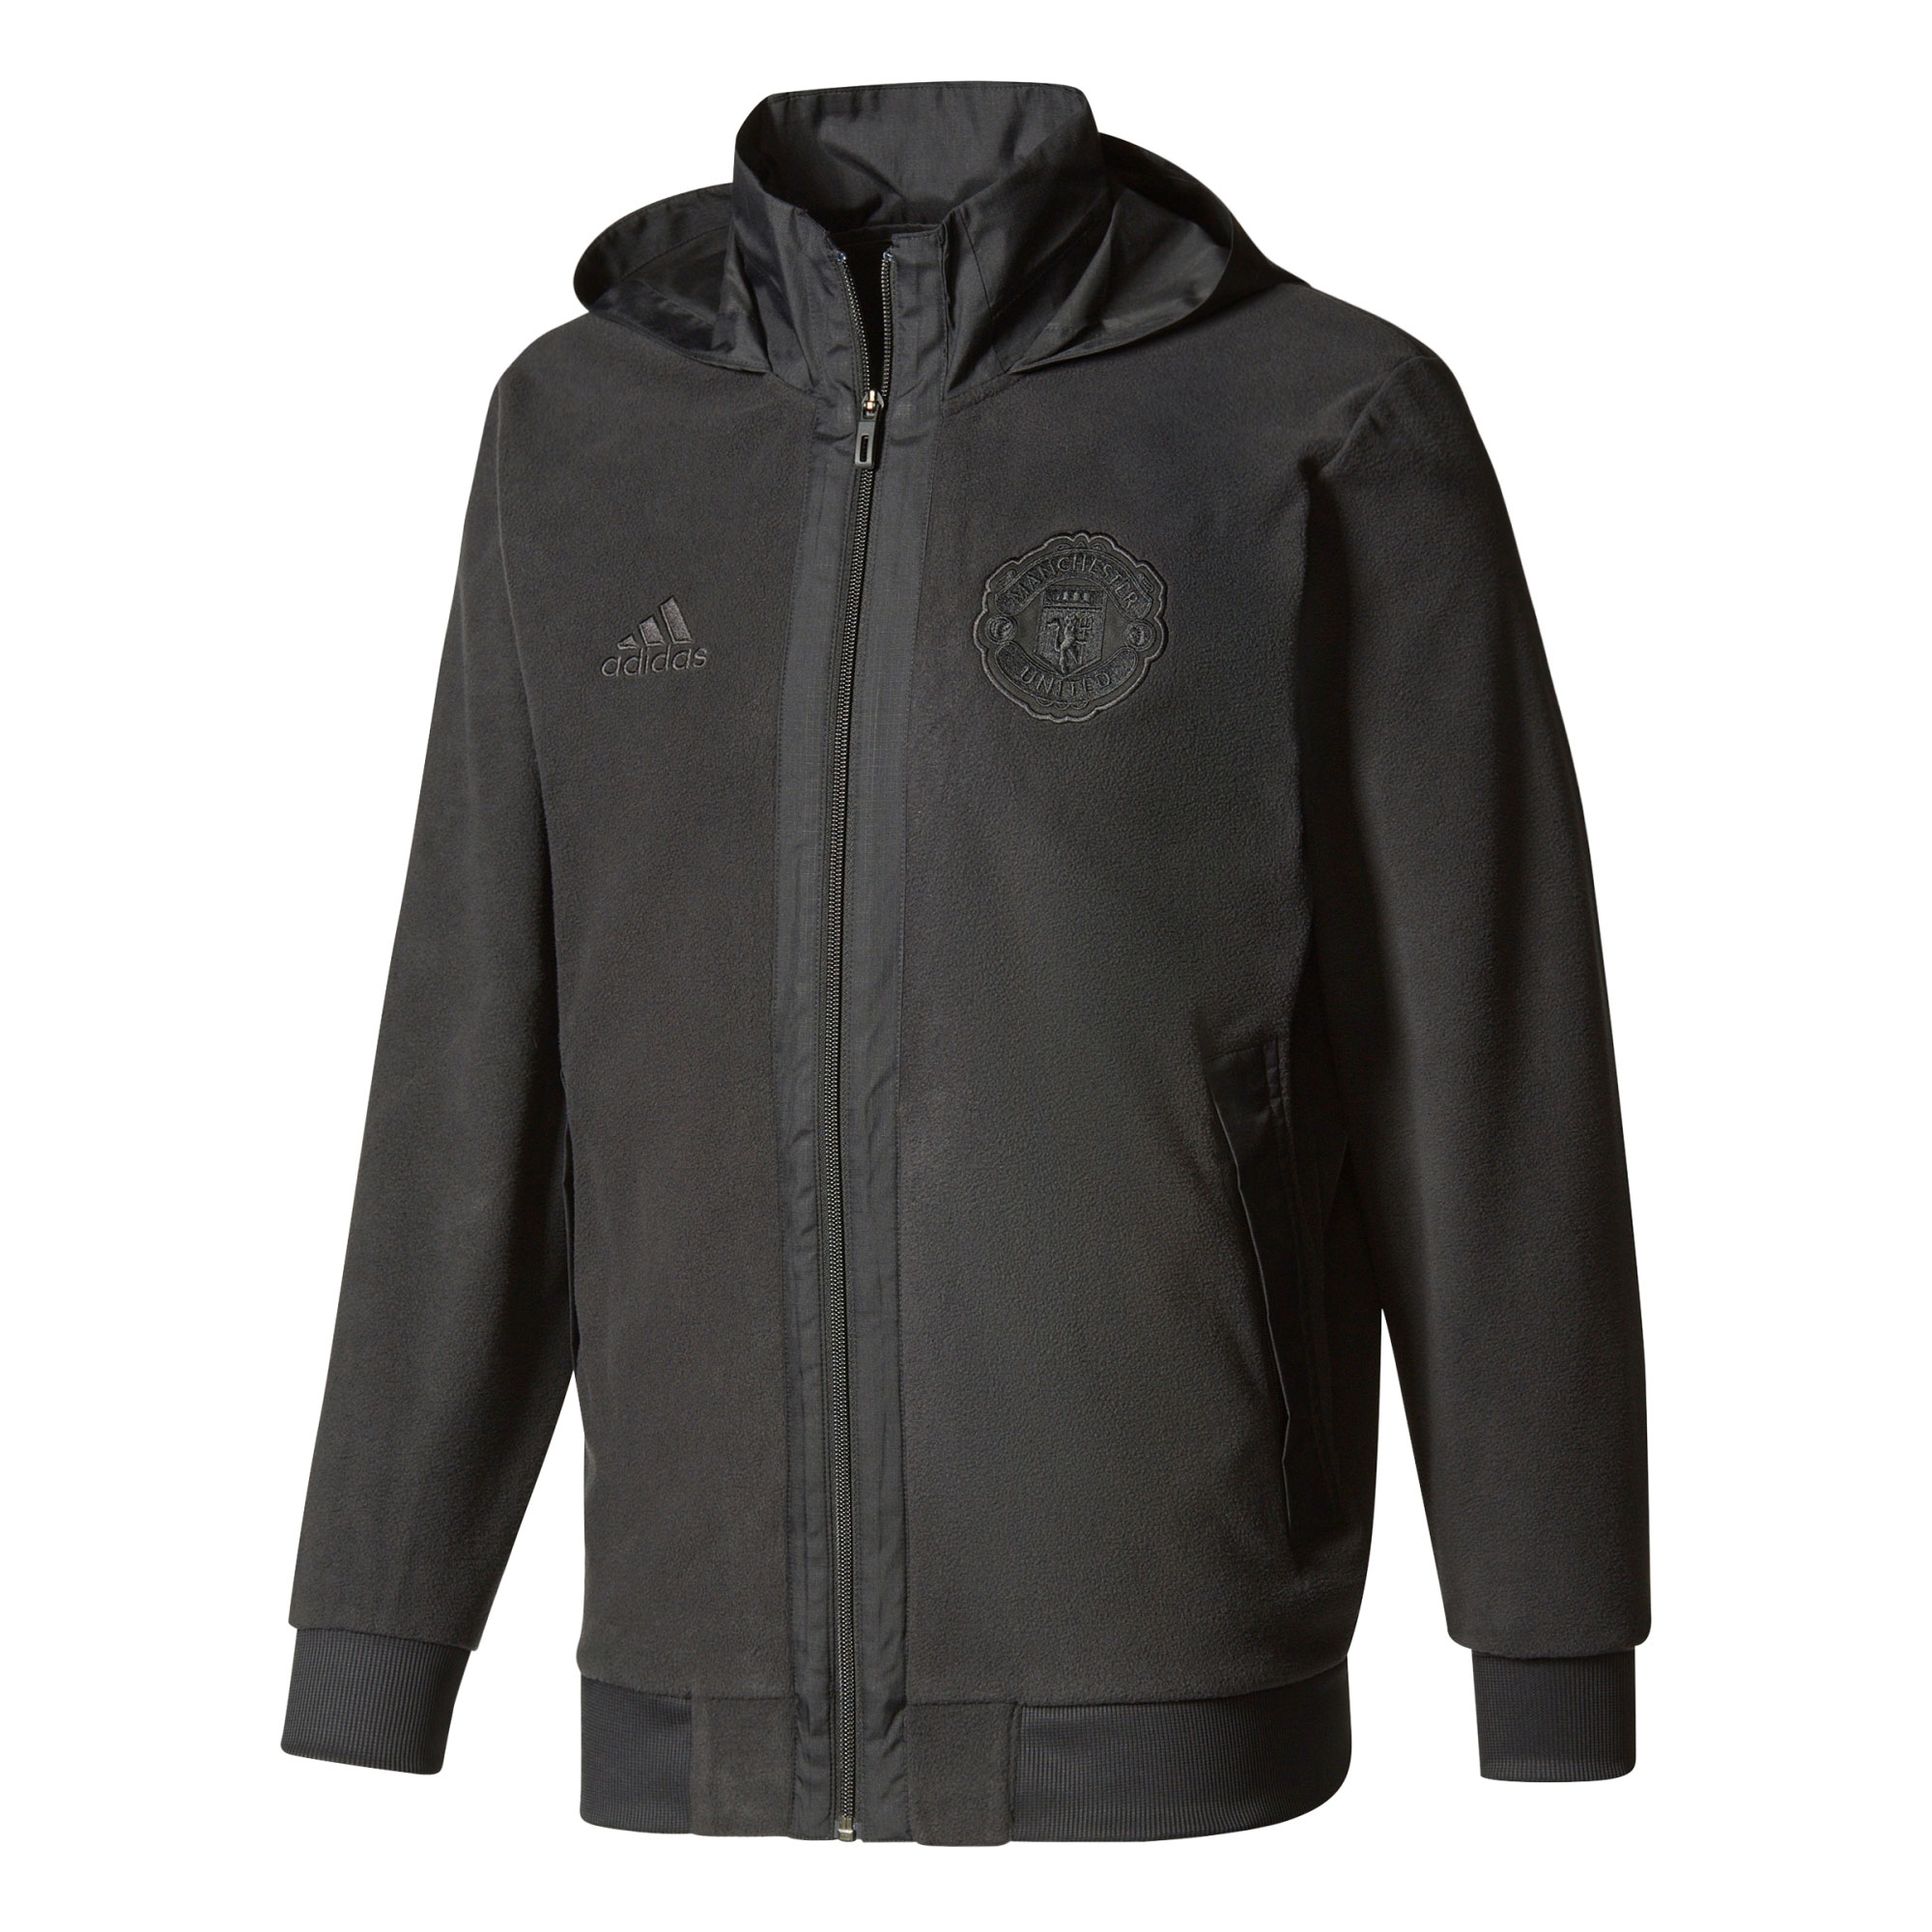 Manchester United Fleece Jacket - Black